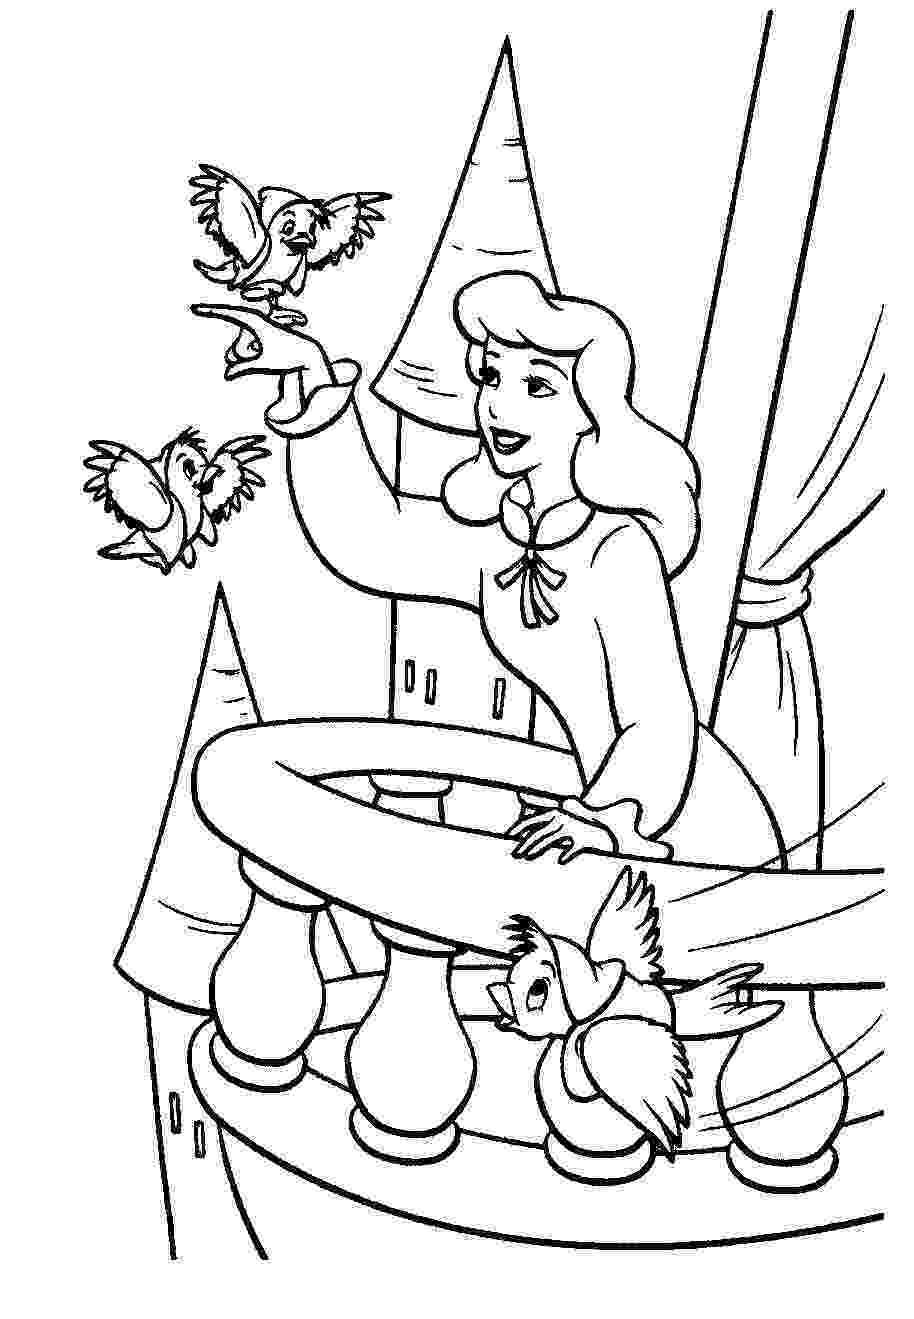 cinderella coloring pages free printable free printable cinderella activity sheets and coloring coloring pages cinderella printable free